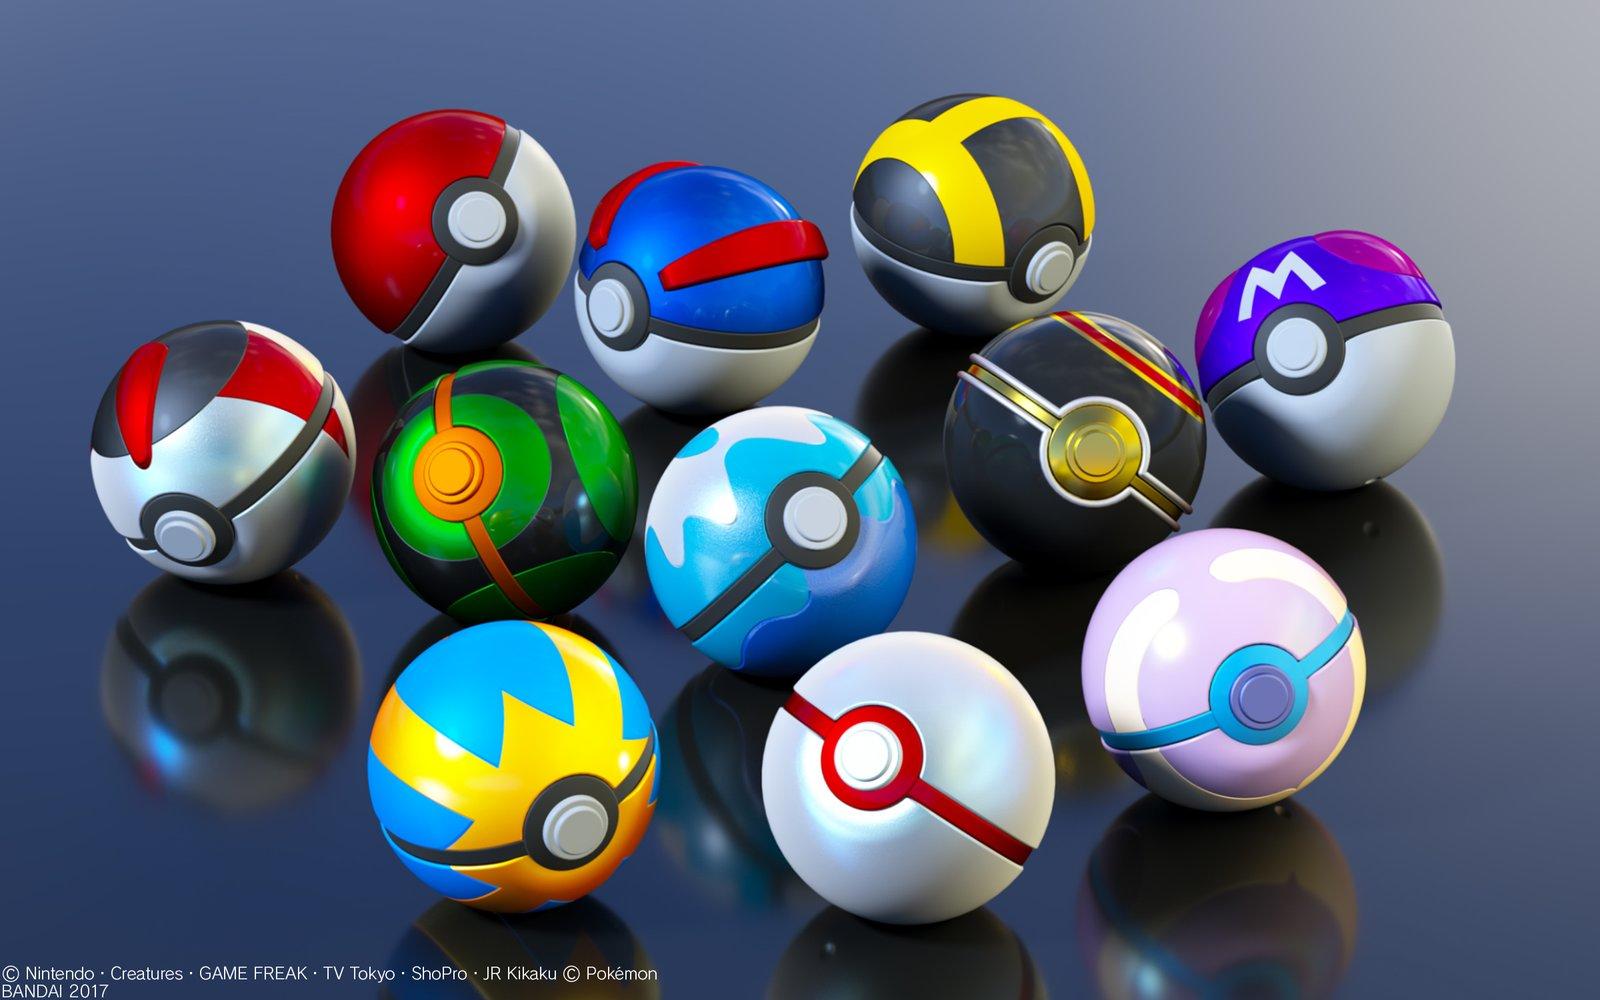 Become A Pokeacutemon Master With Bandaiaposs Pokeacute Ball Collection